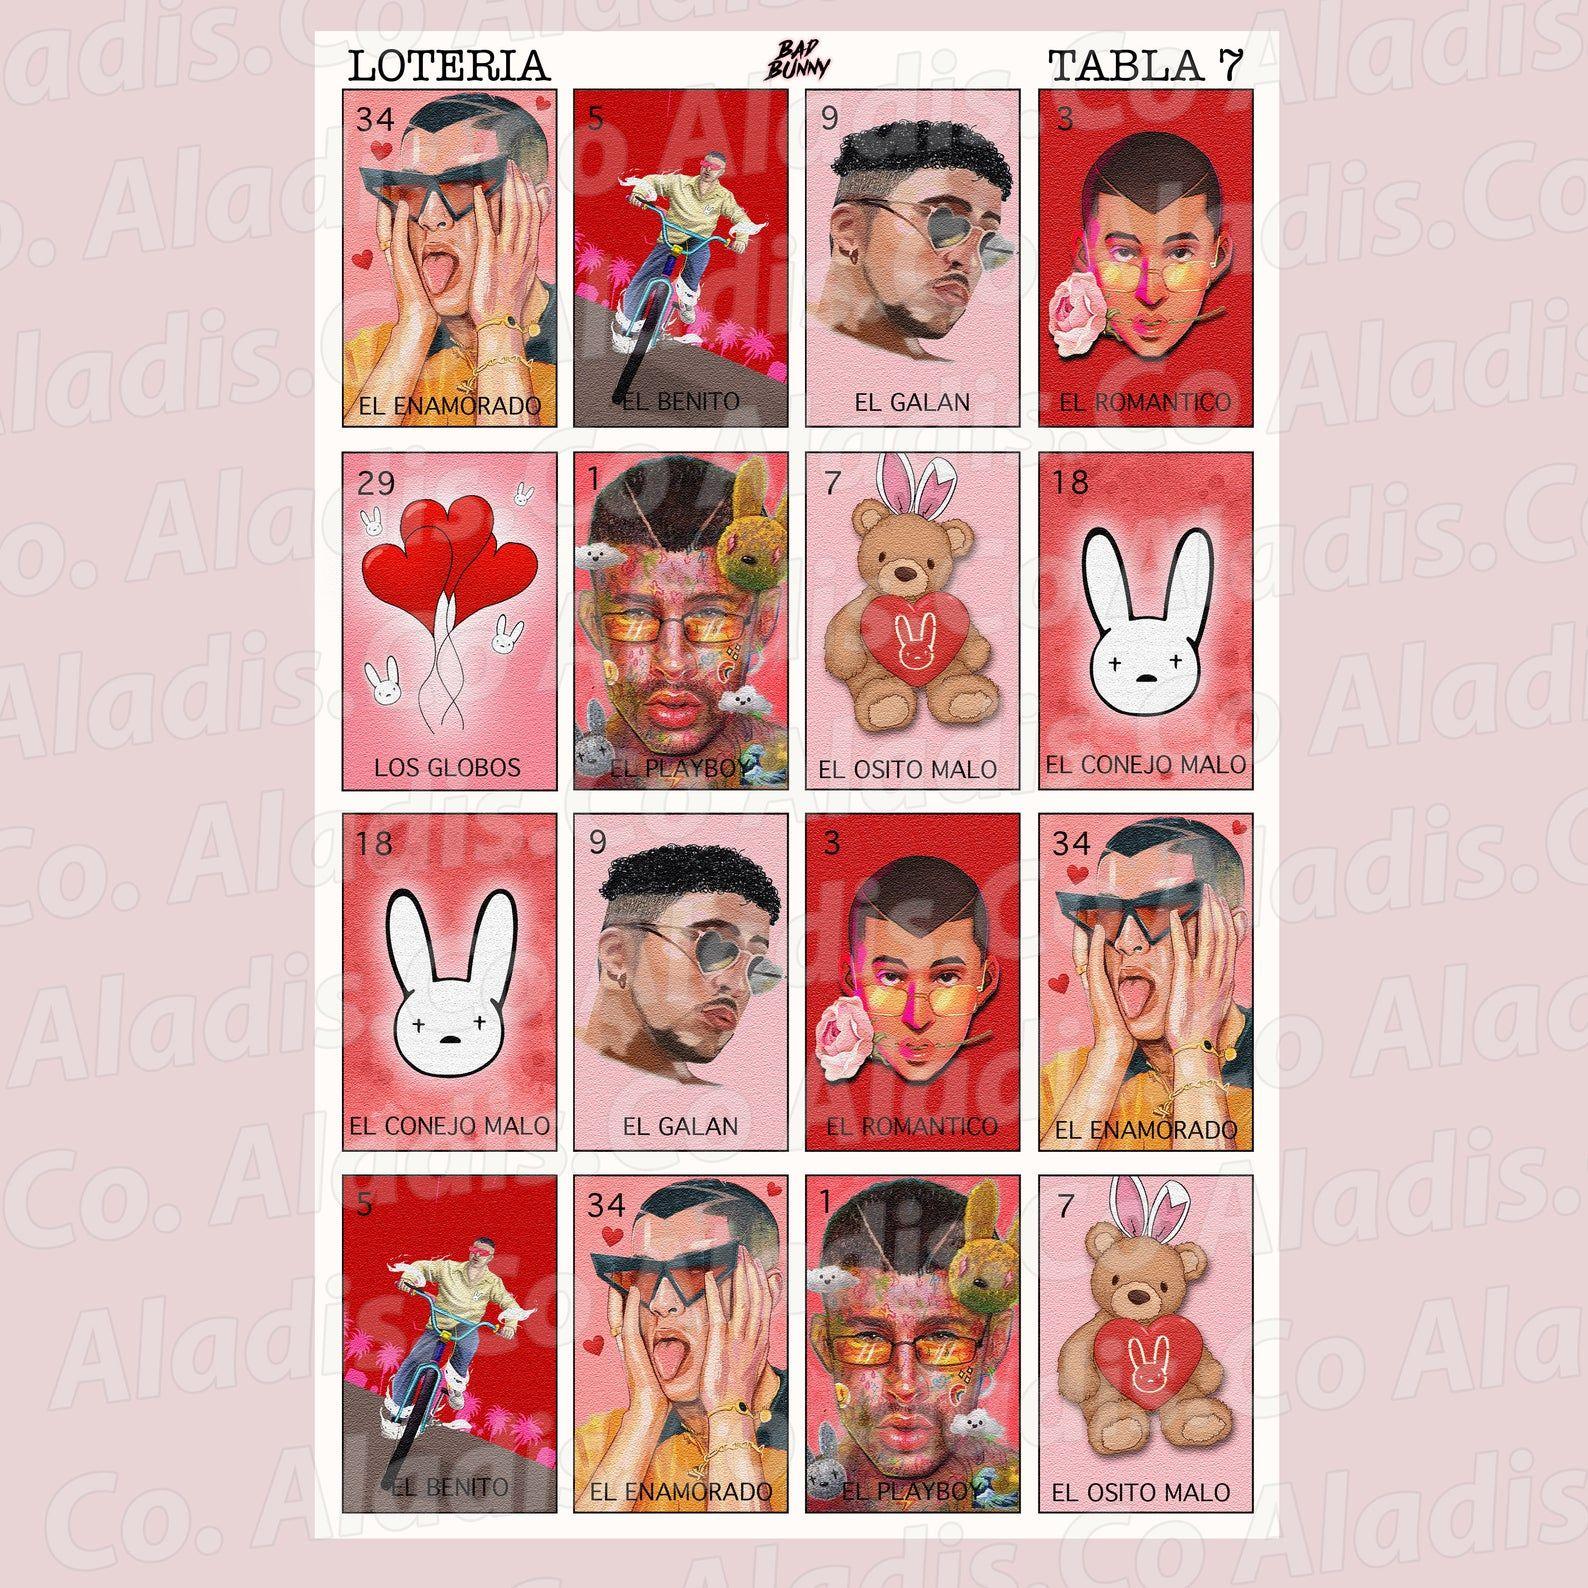 Bad Bunny Loteria Png File In 2021 Bunny Designs Printed Backdrops Digital Graphics